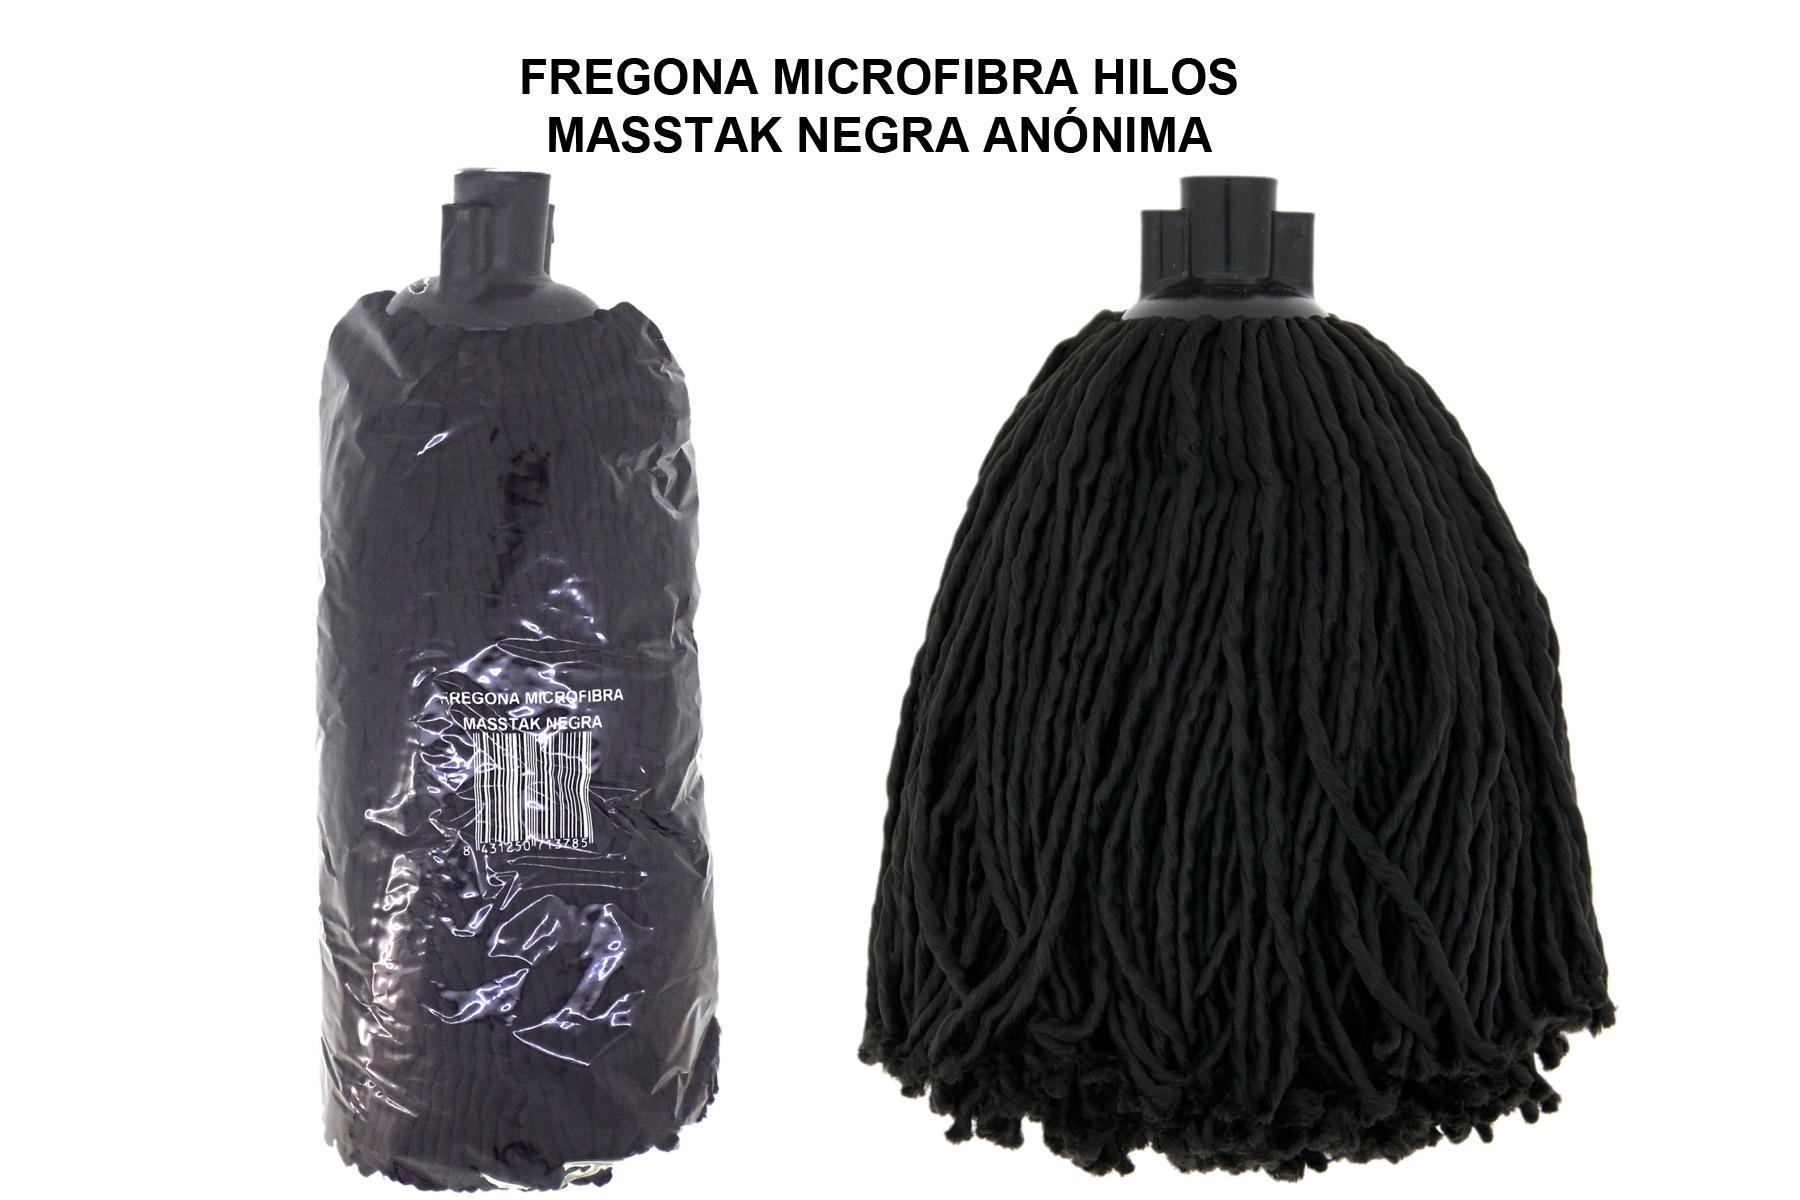 FREGONA MICROFIBRA MASSTAK NEGRA ANONIMA